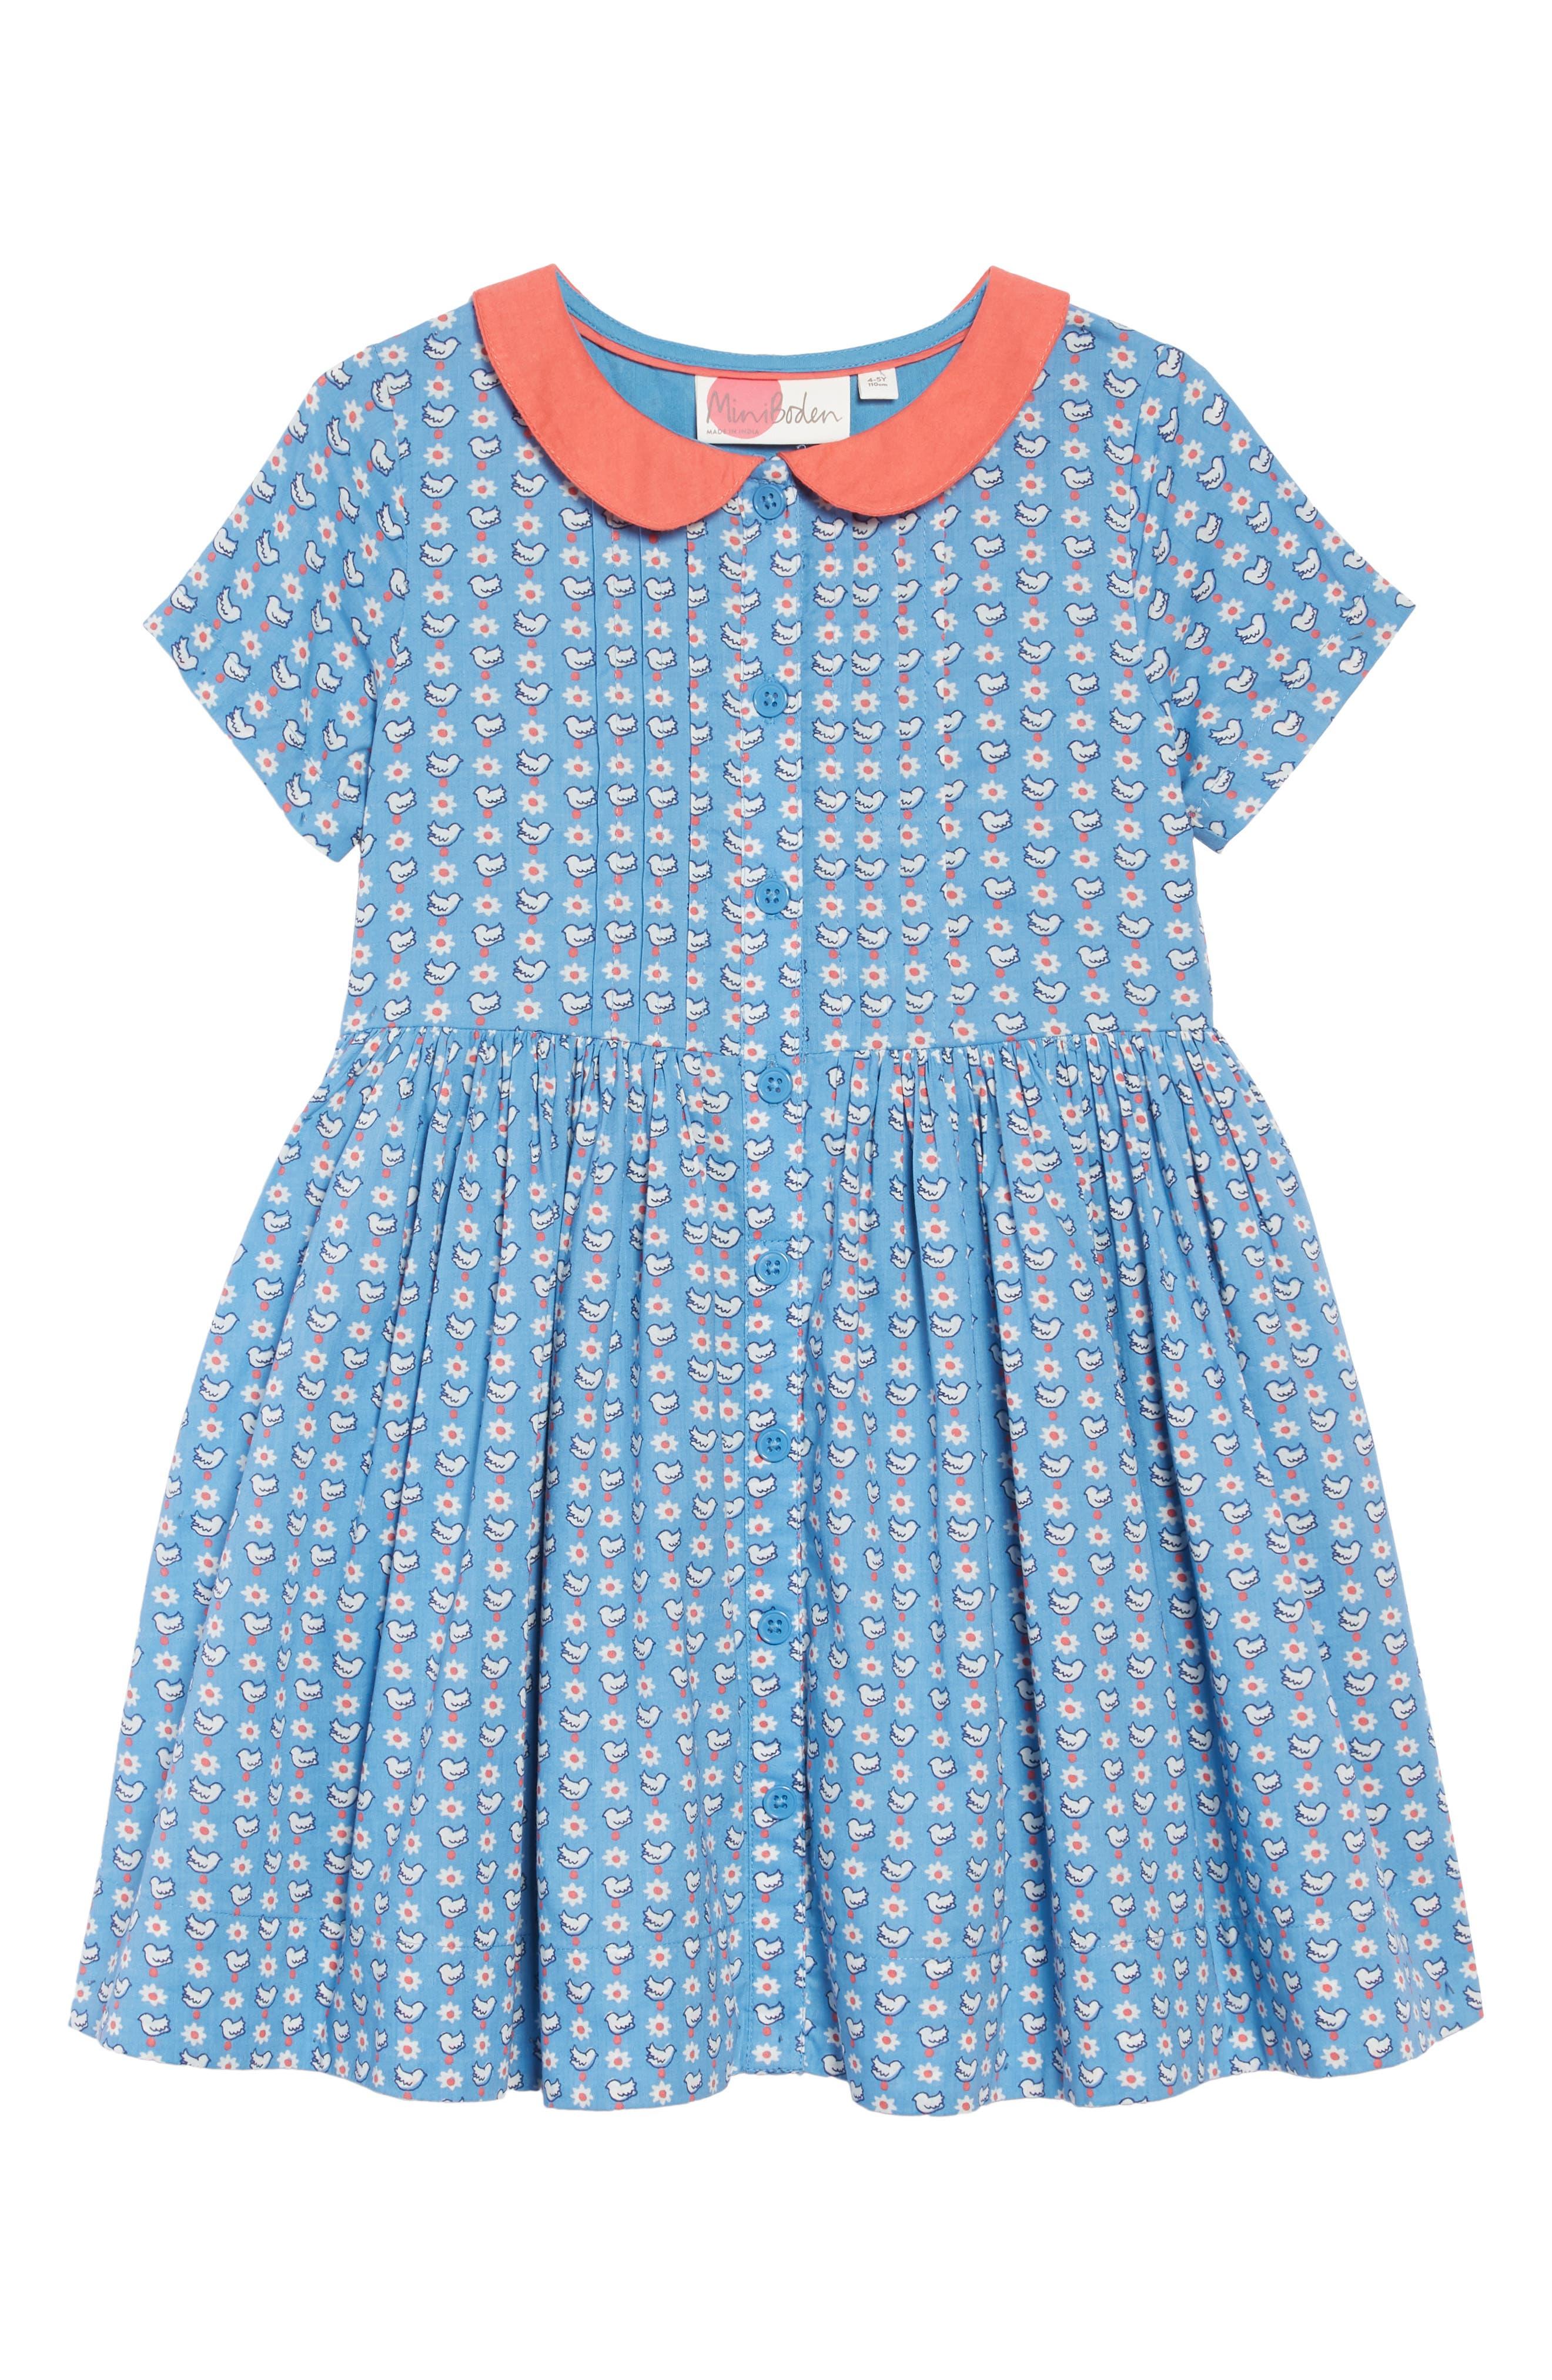 Nostalgic Collared Dress,                             Main thumbnail 1, color,                             454